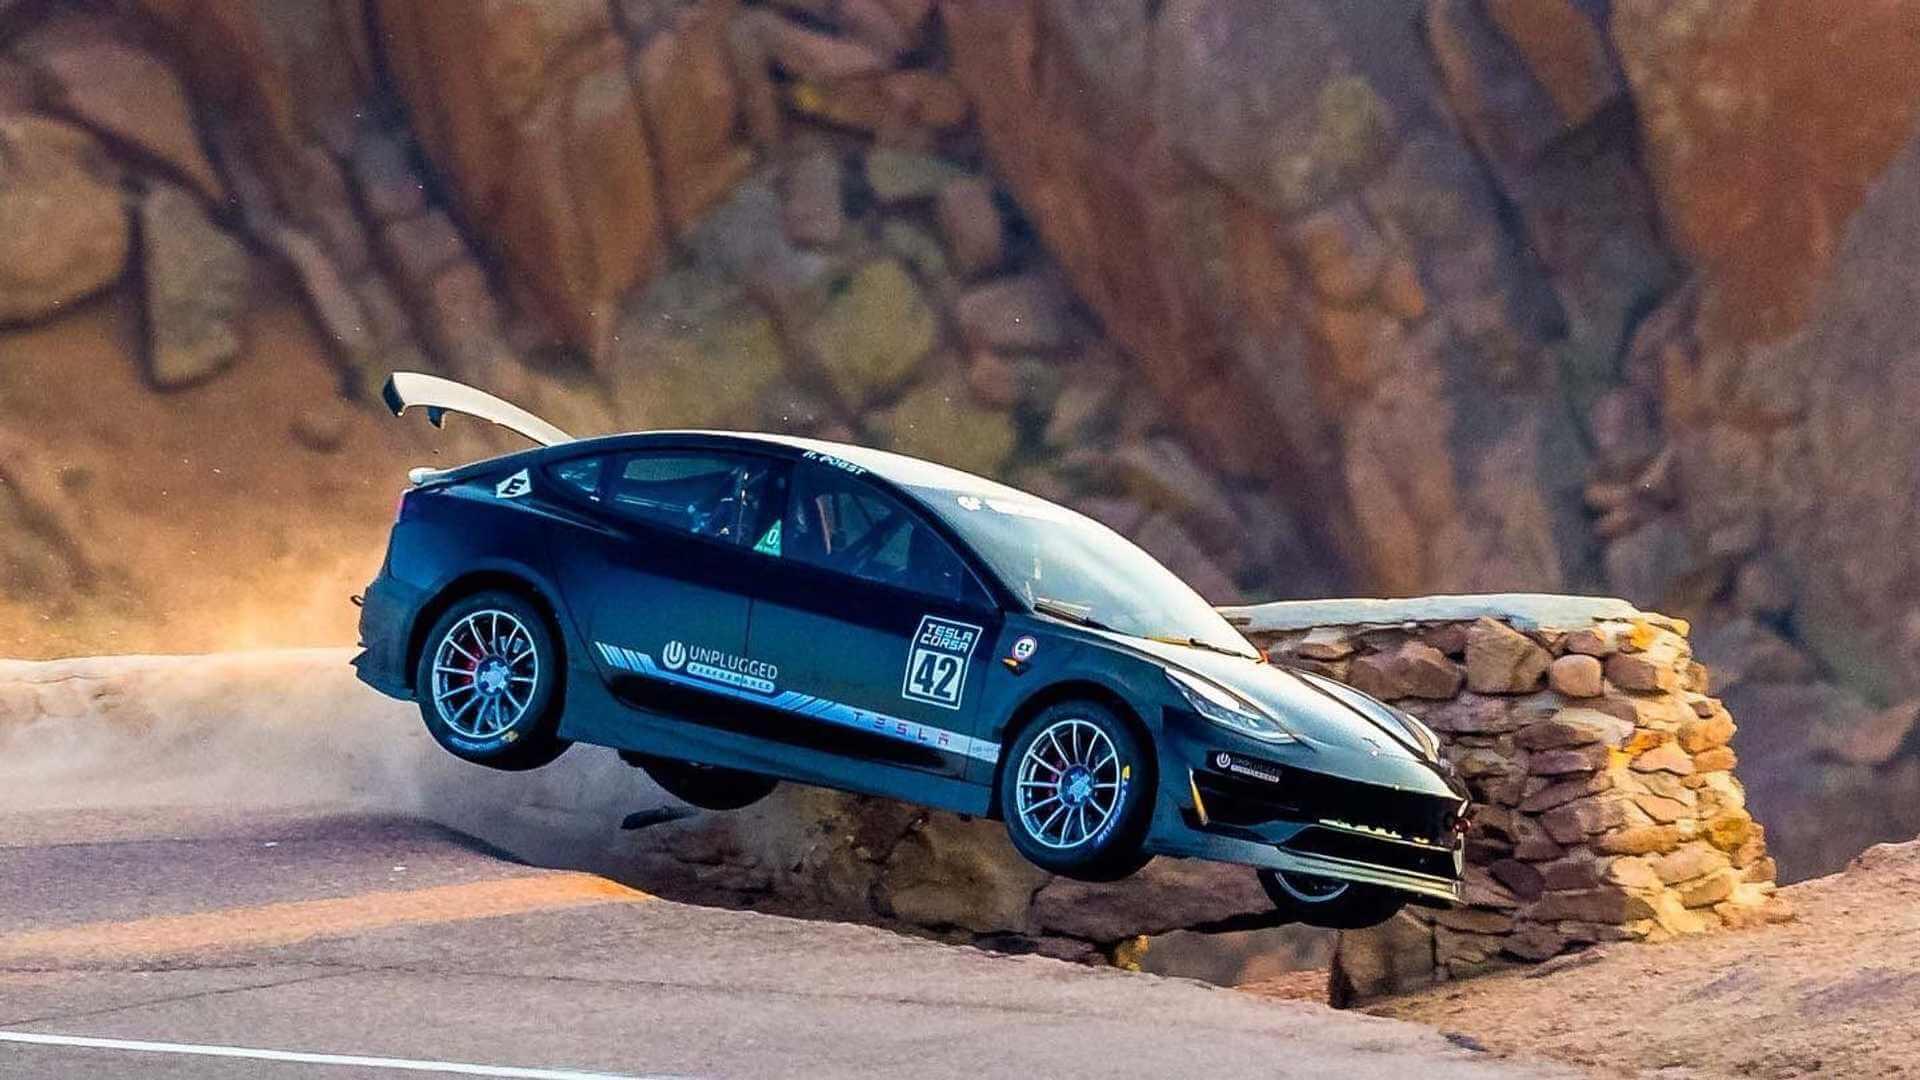 Тюнингованная Tesla Model 3 от Unplugged Performance попала в аварию на Pikes Peak